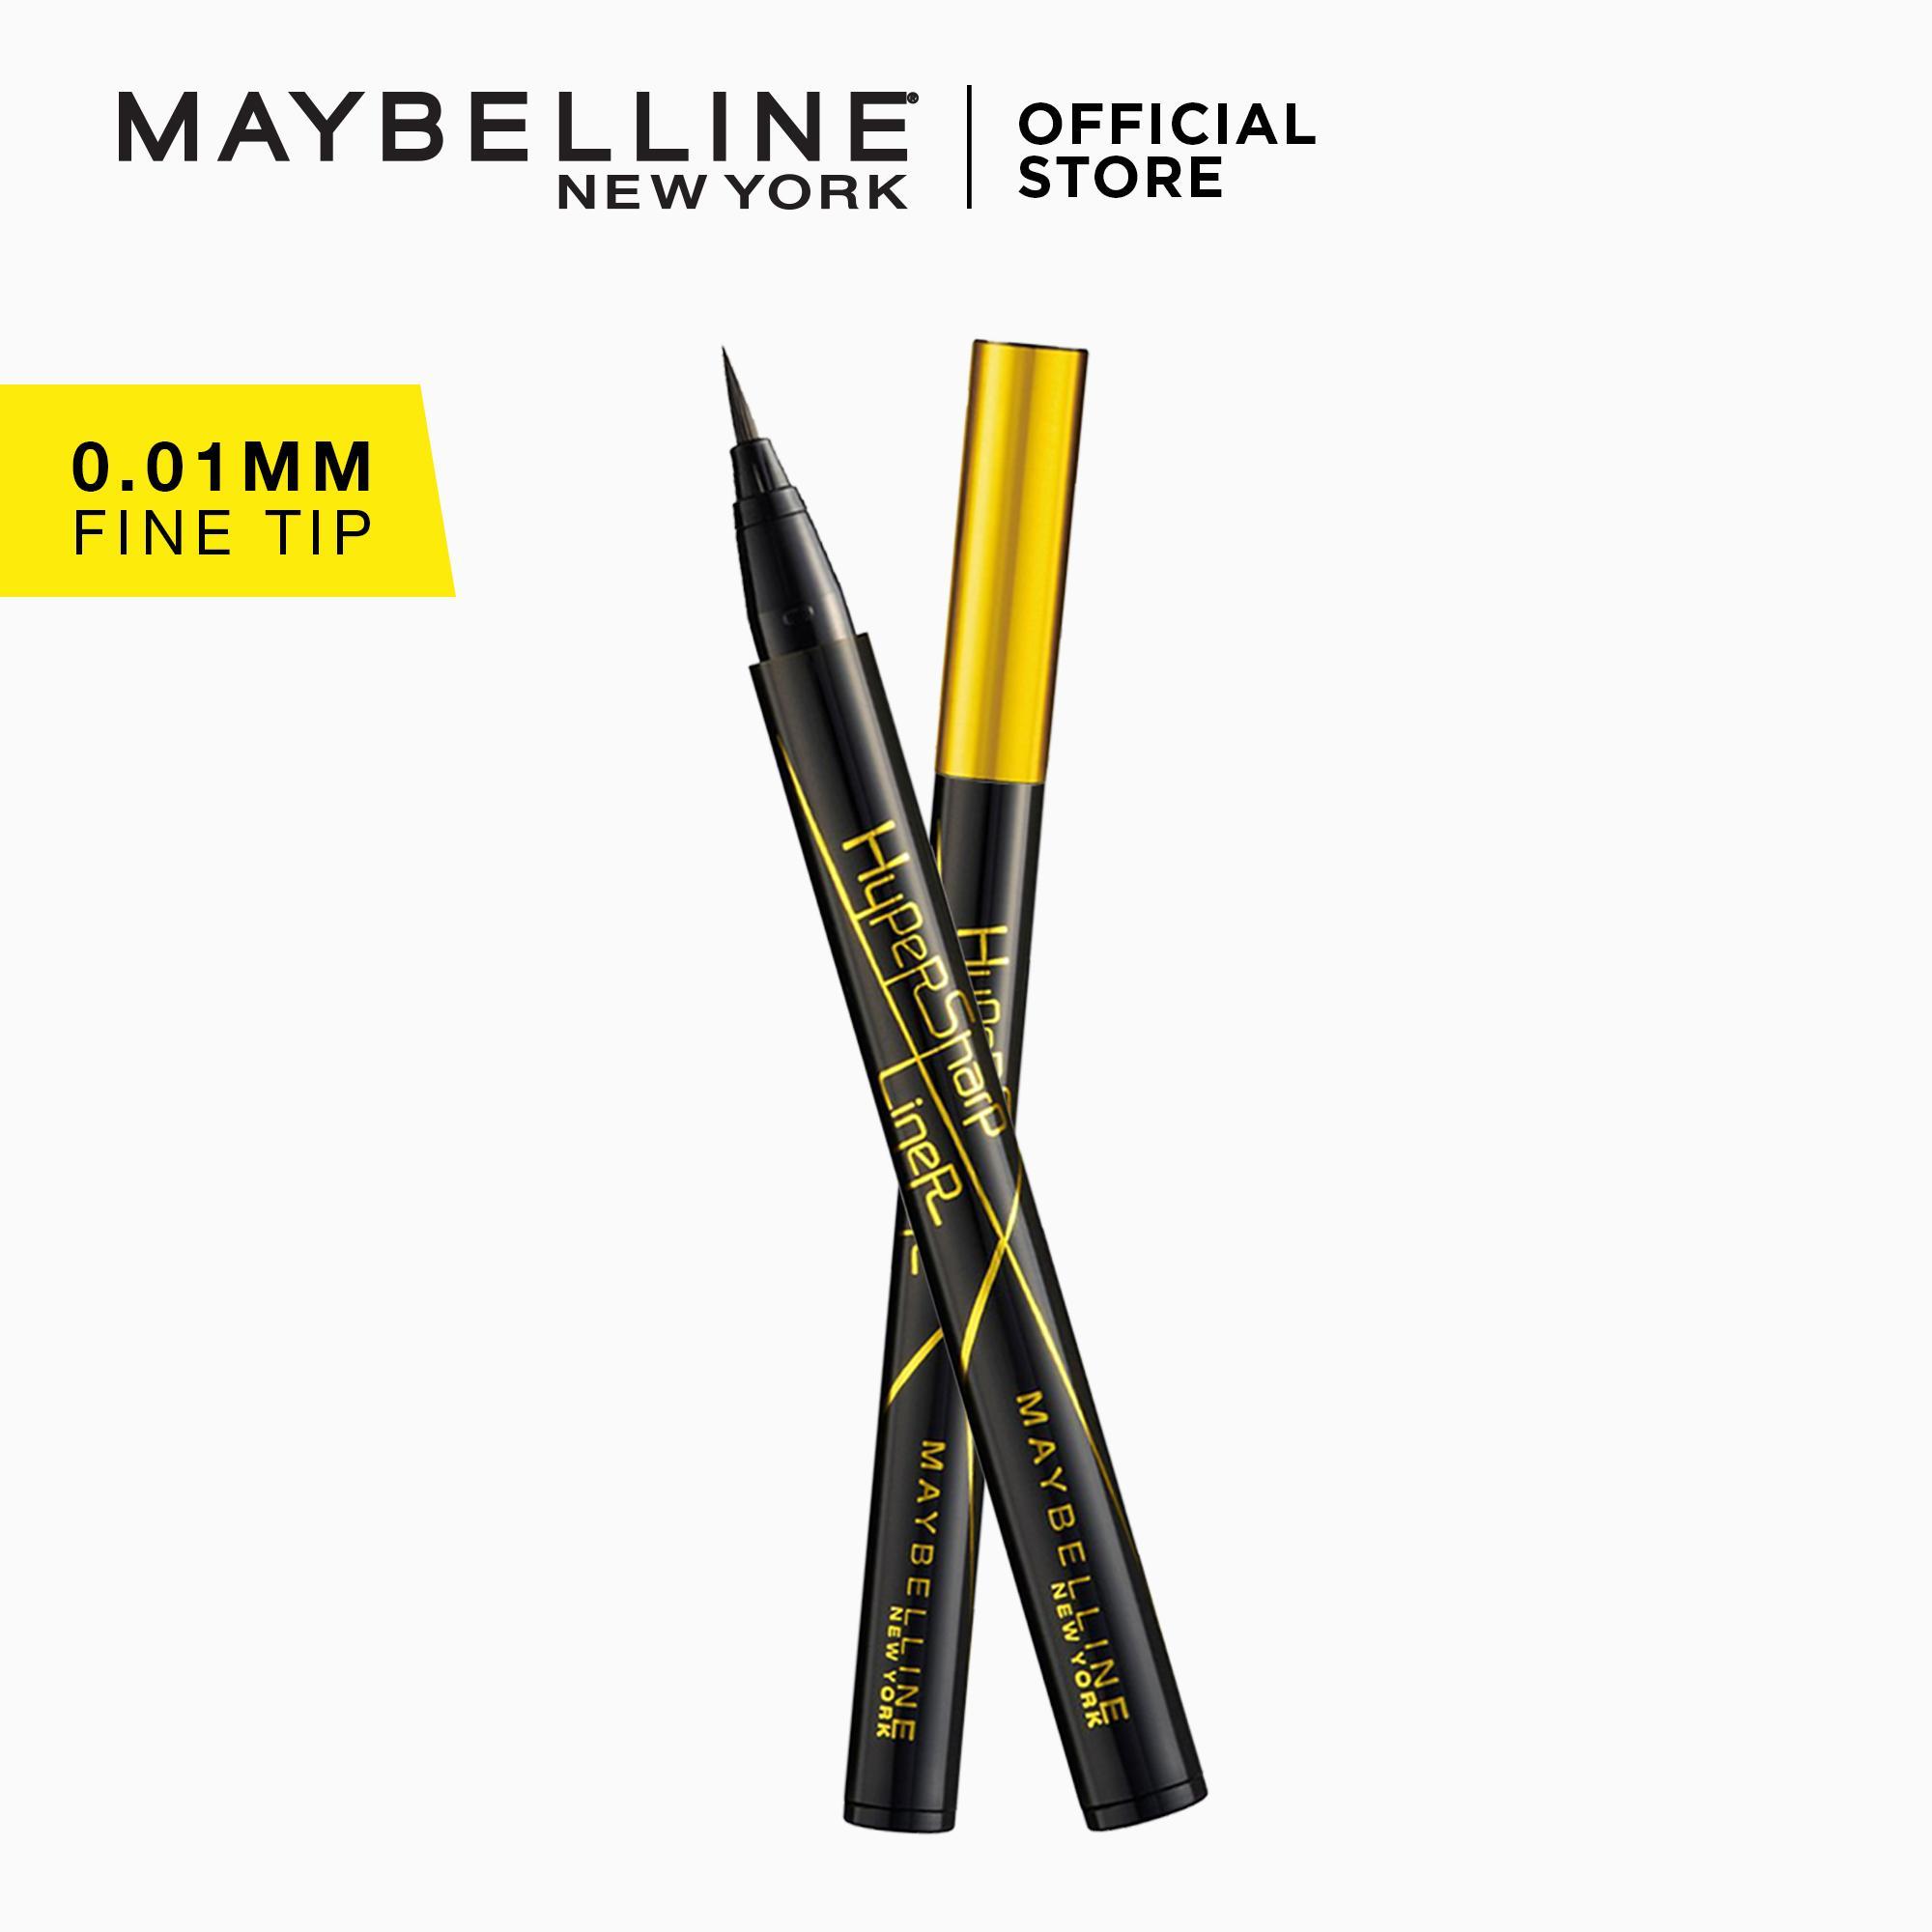 Hypersharp Laser Liquid Pen Eyeliner - Black [ultra Precise] By Maybelline By Maybelline.